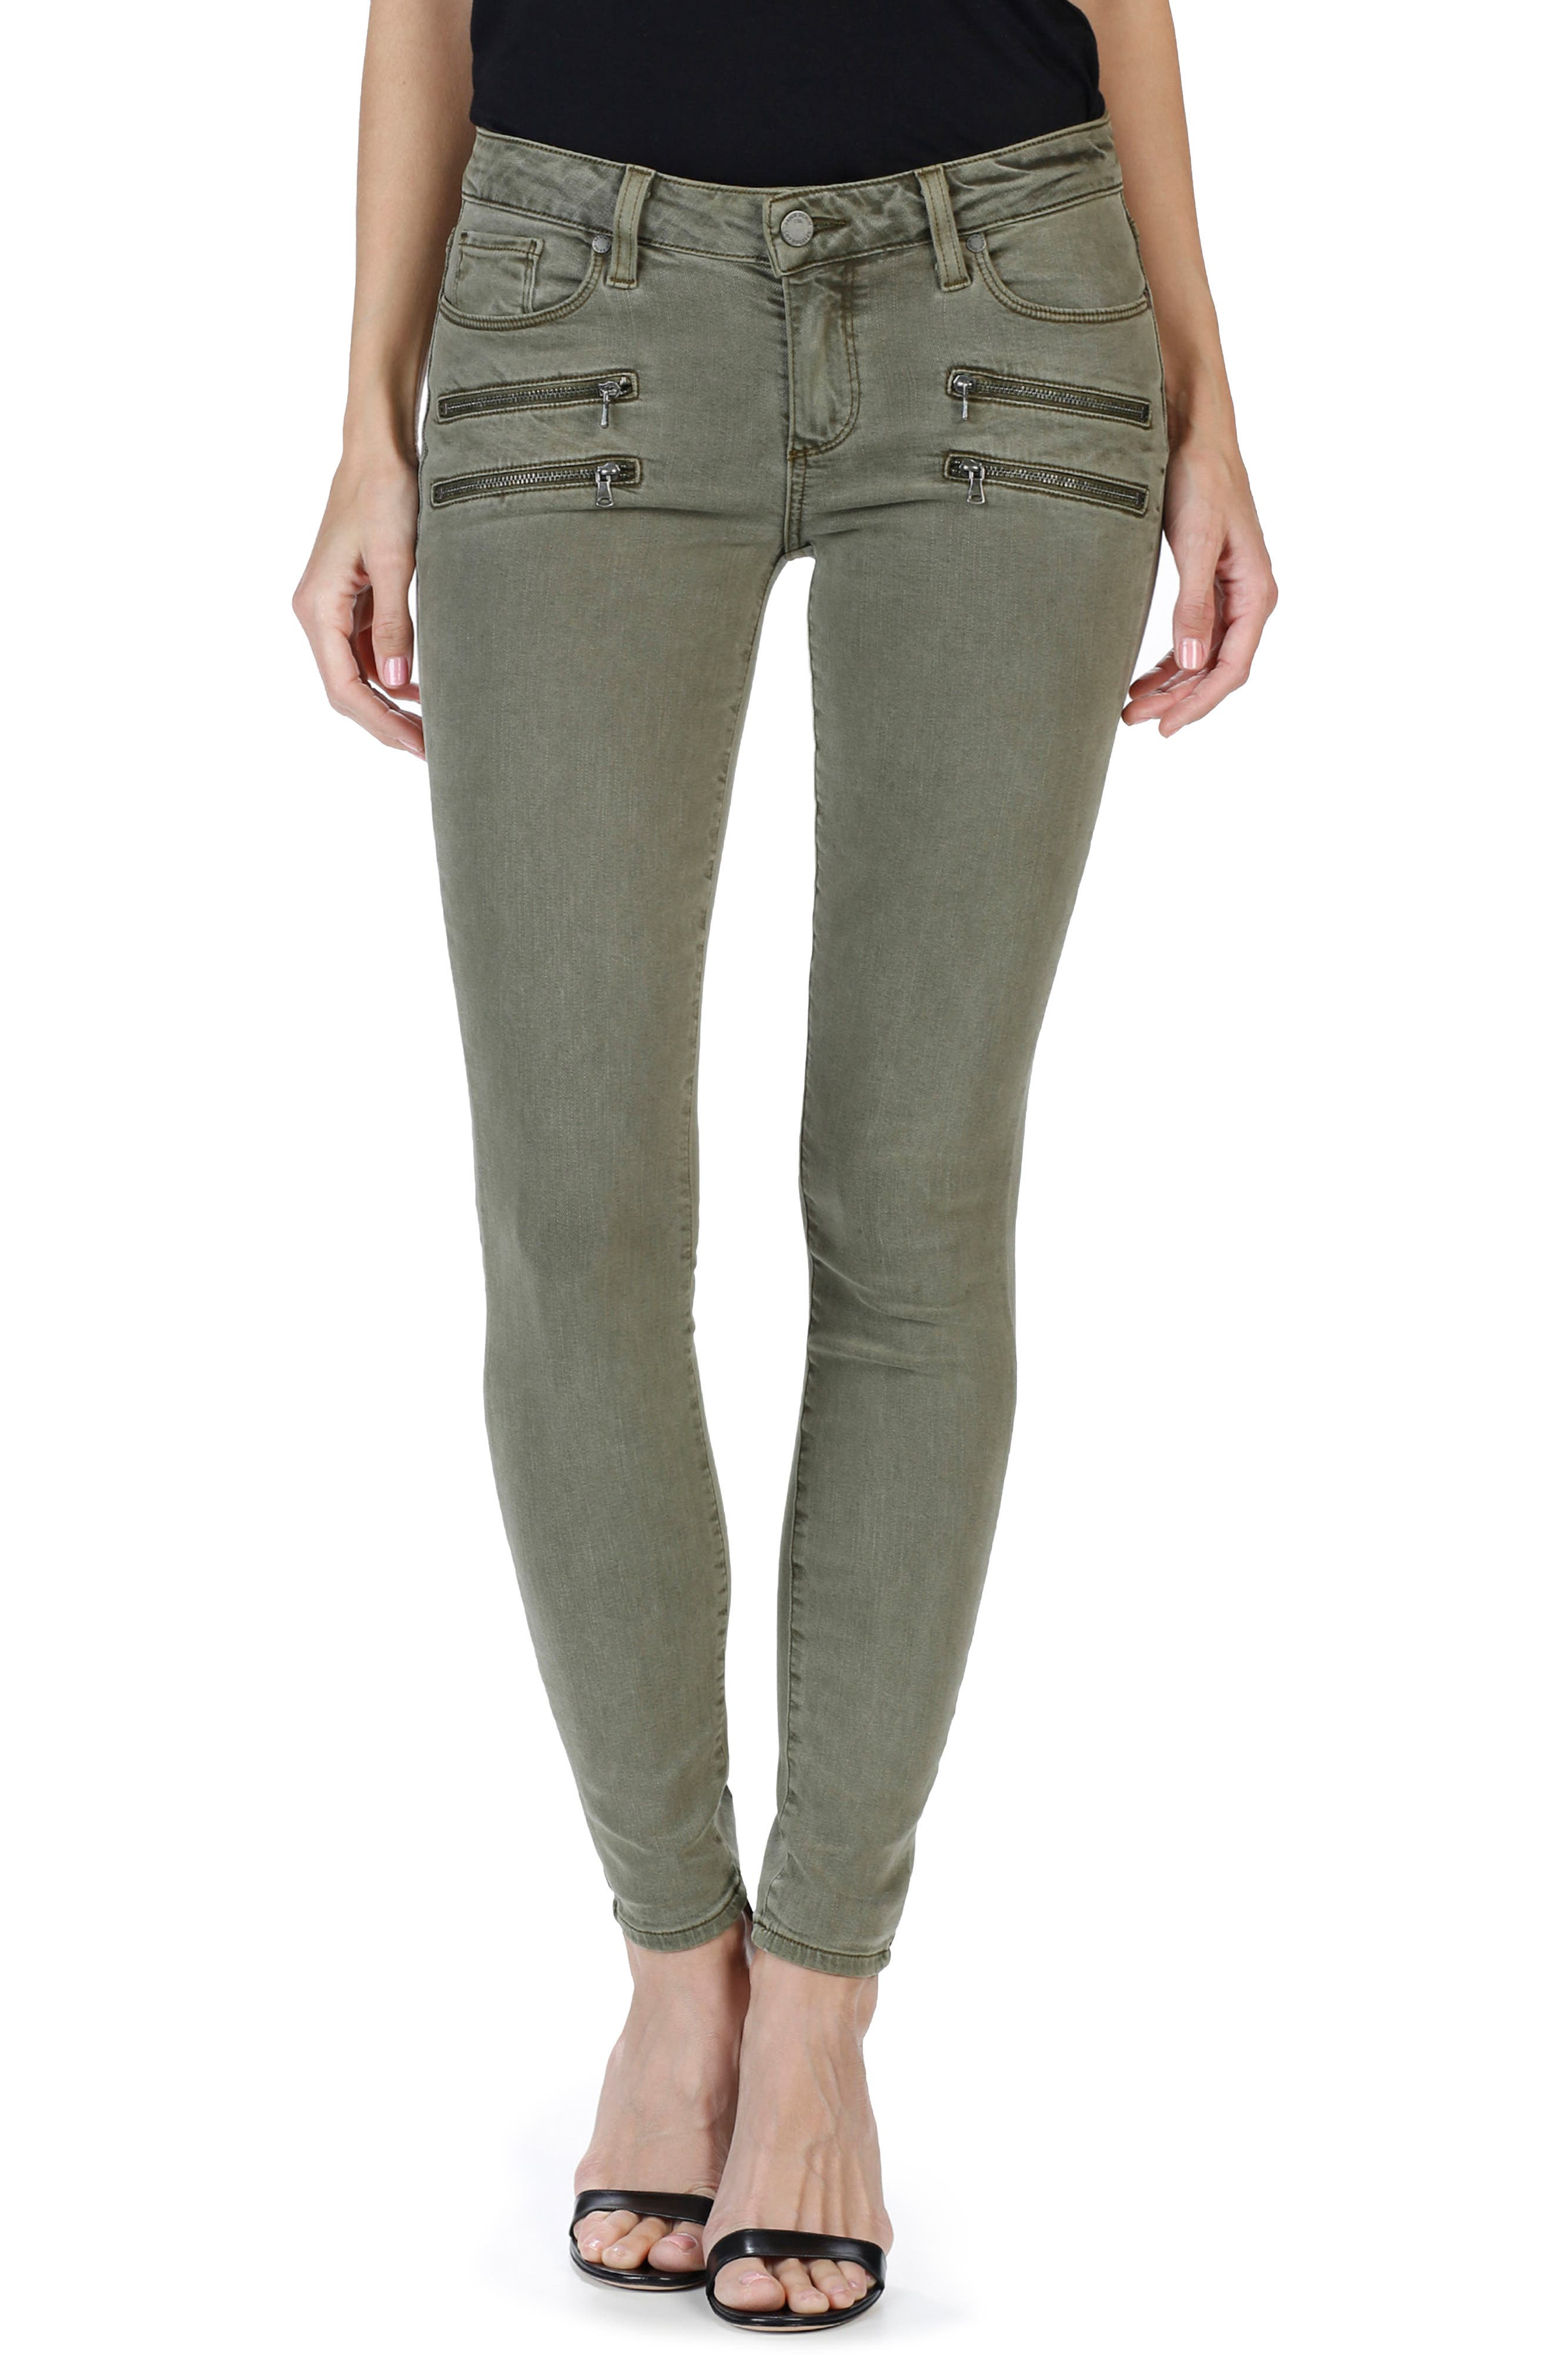 PAIGE Edgemont High Waist Ultra Skinny Jeans